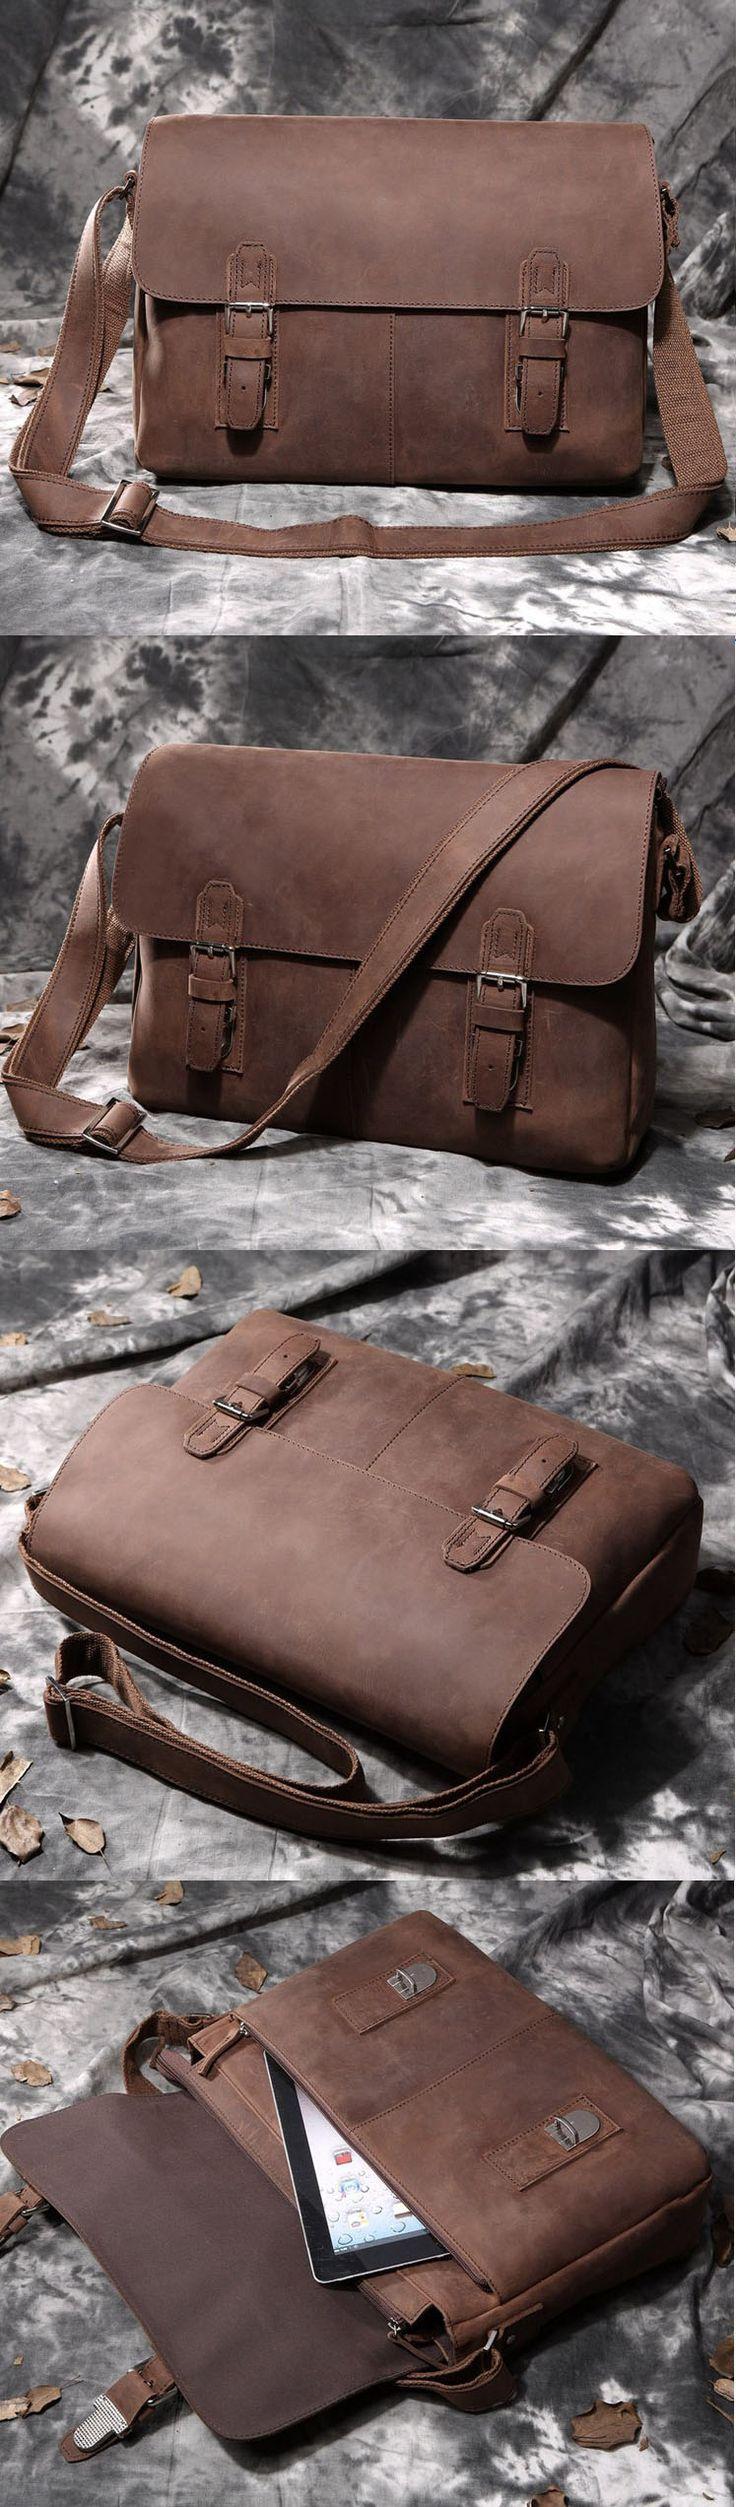 "Arrogance Crazy Horse Leather Hard Briefcase Messenger 13"" 15"" Macbook Laptop Bag Valentine's Gift - ladies bag collection, ladies bags sale, cheap designer crossbody bags *sponsored https://www.pinterest.com/bags_bag/ https://www.pinterest.com/explore/bag/ https://www.pinterest.com/bags_bag/radley-bags/ https://www.tradesy.com/bags/"